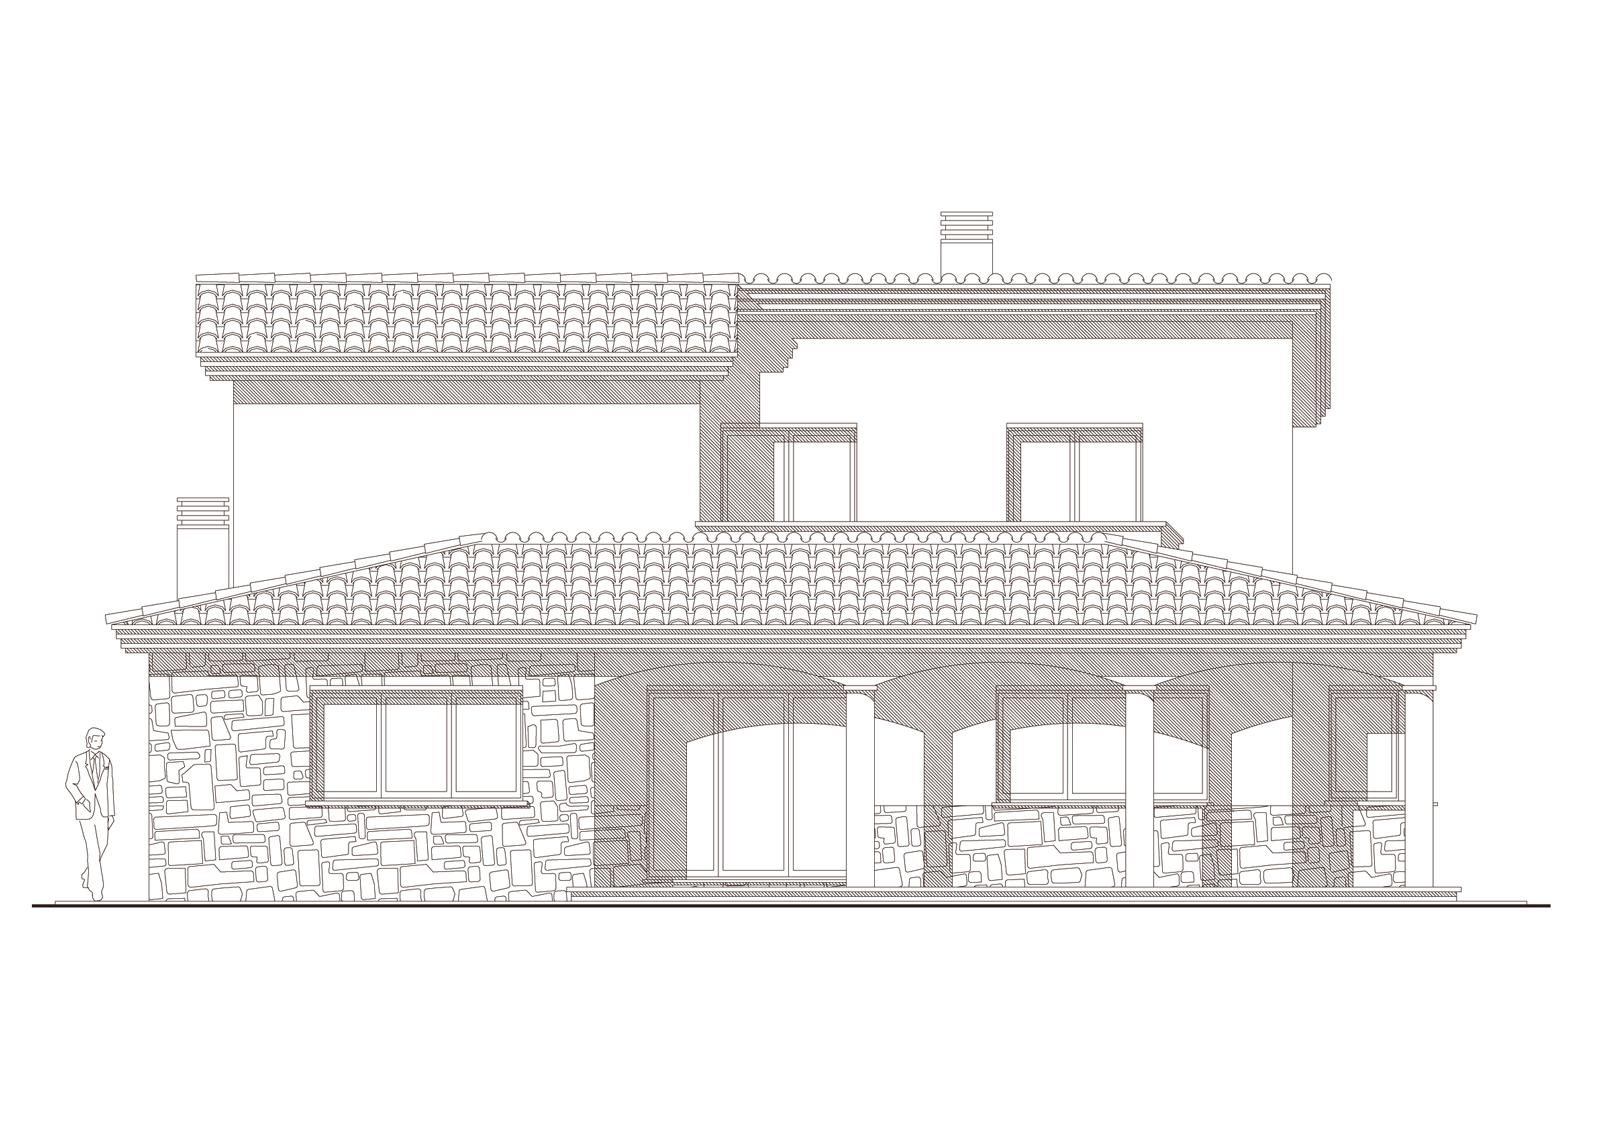 Alçat oest. Projecte d'obra nova: 1998 Habitatge unifamiliar aïllat